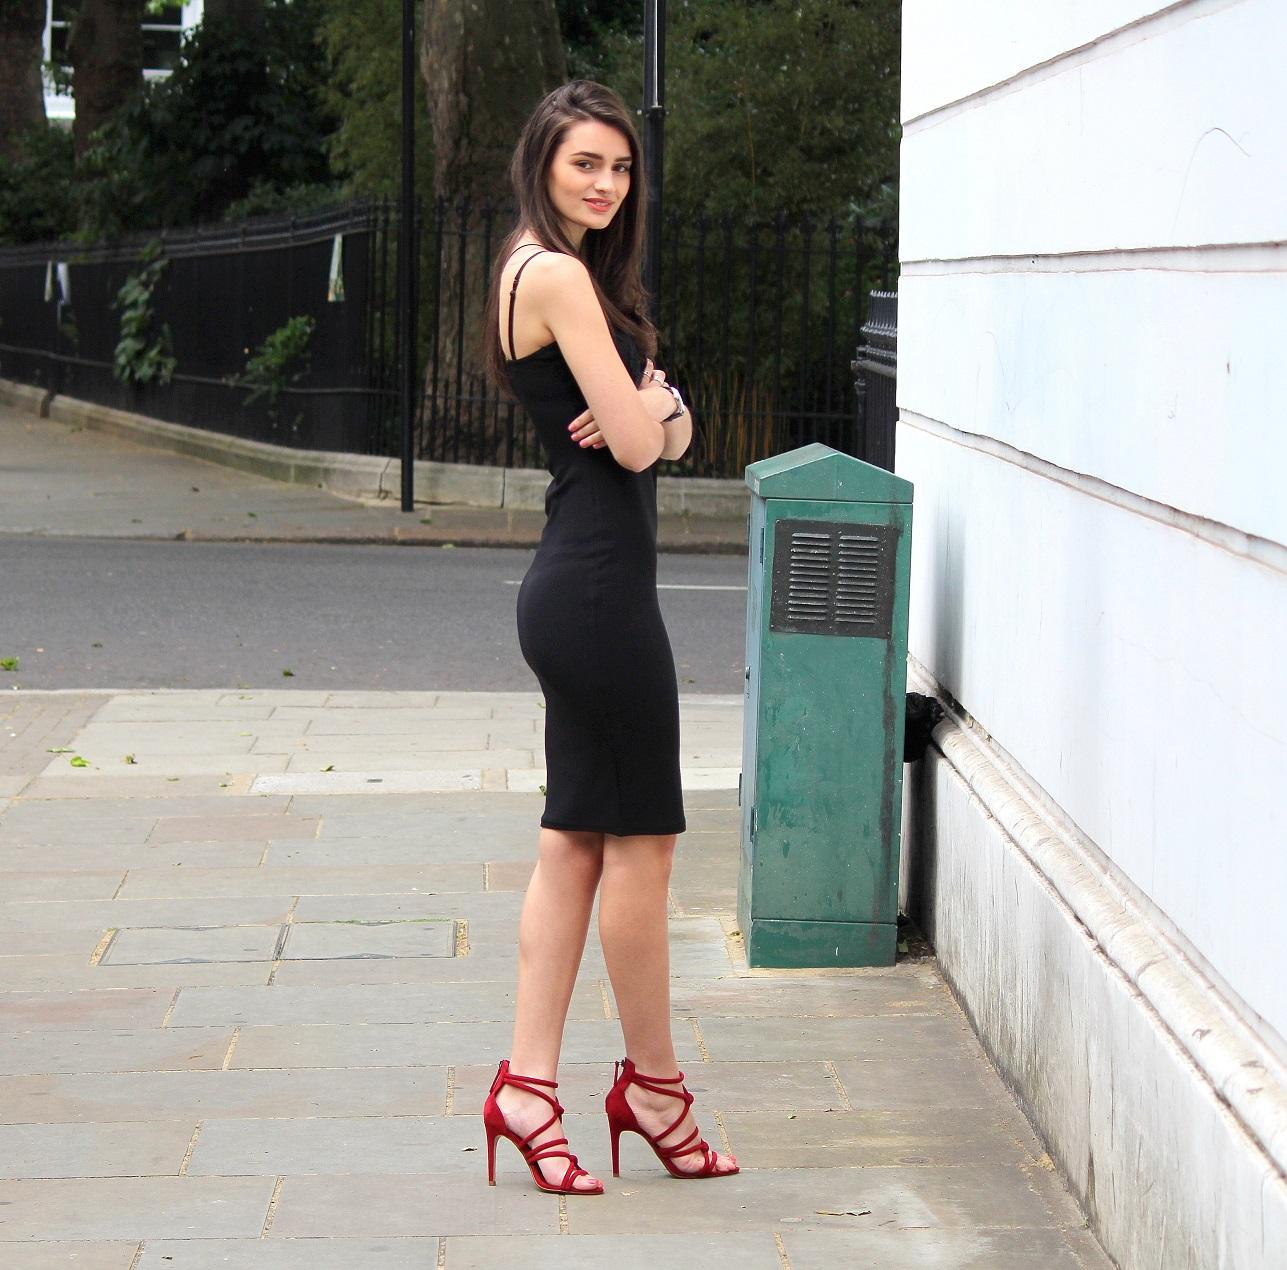 Black dress heels - Heels For A Black Dress